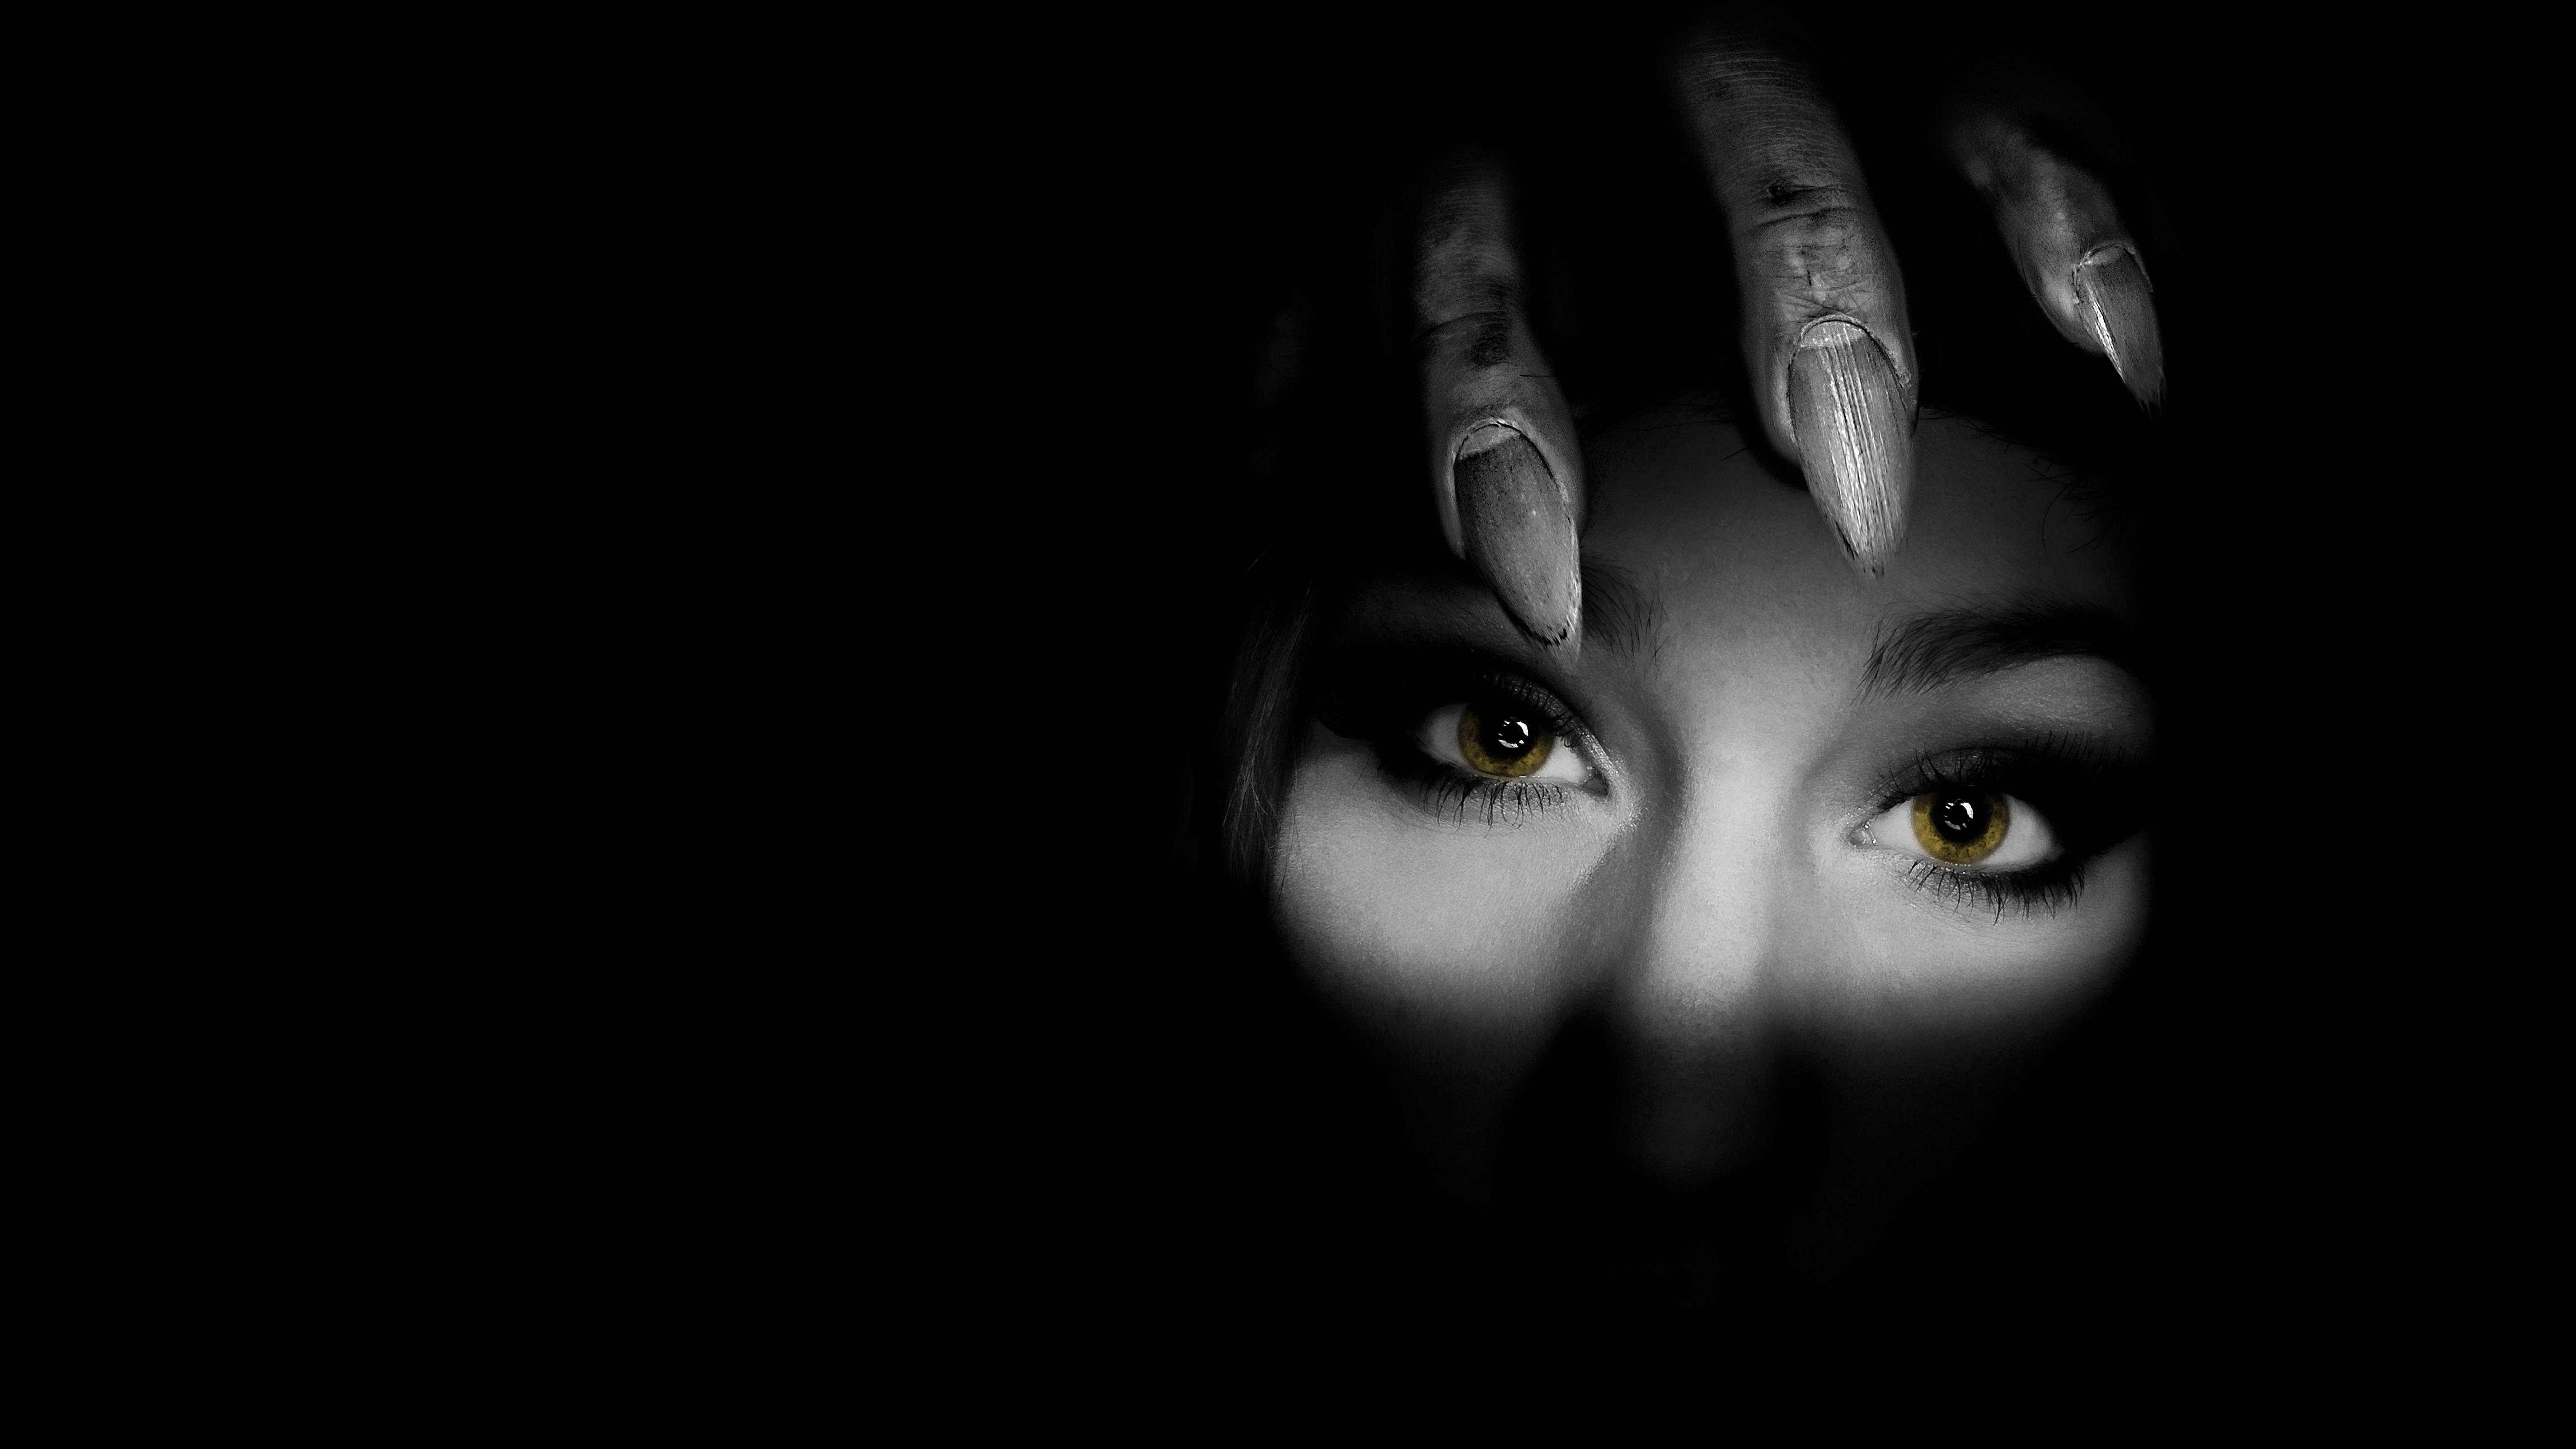 Creepy 5k retina ultra hd wallpaper and background image - Dark horror creepy wallpapers ...